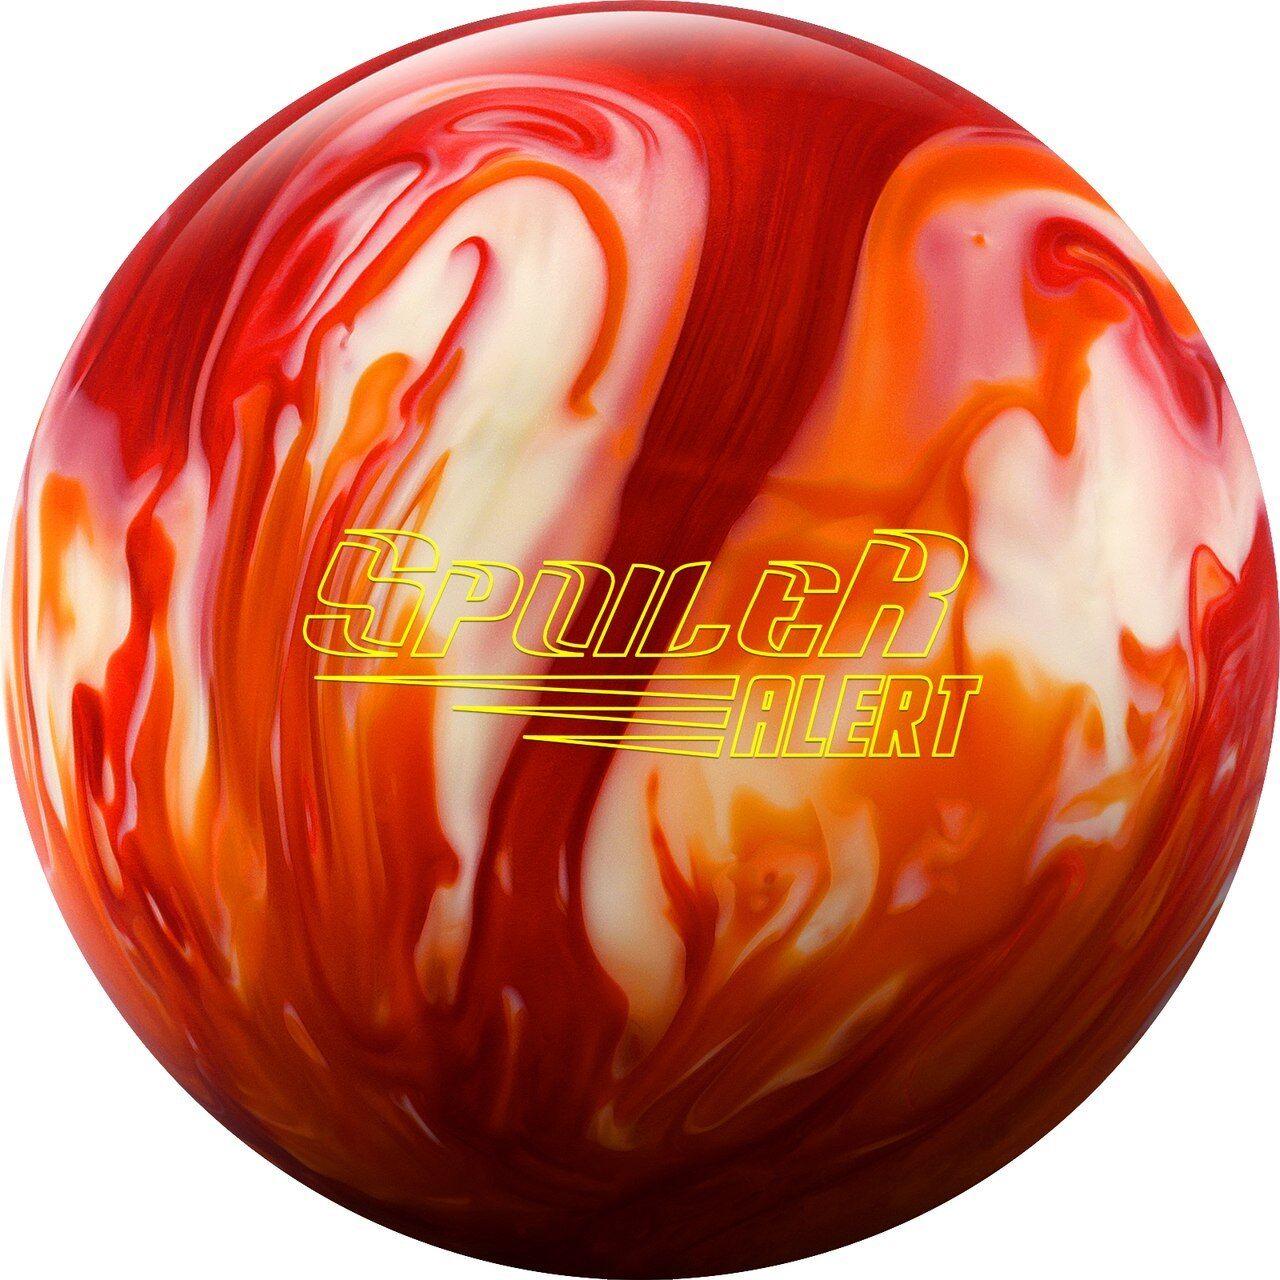 Columbia 300 Spoiler Alert Bowling Ball NIB 1st Quality